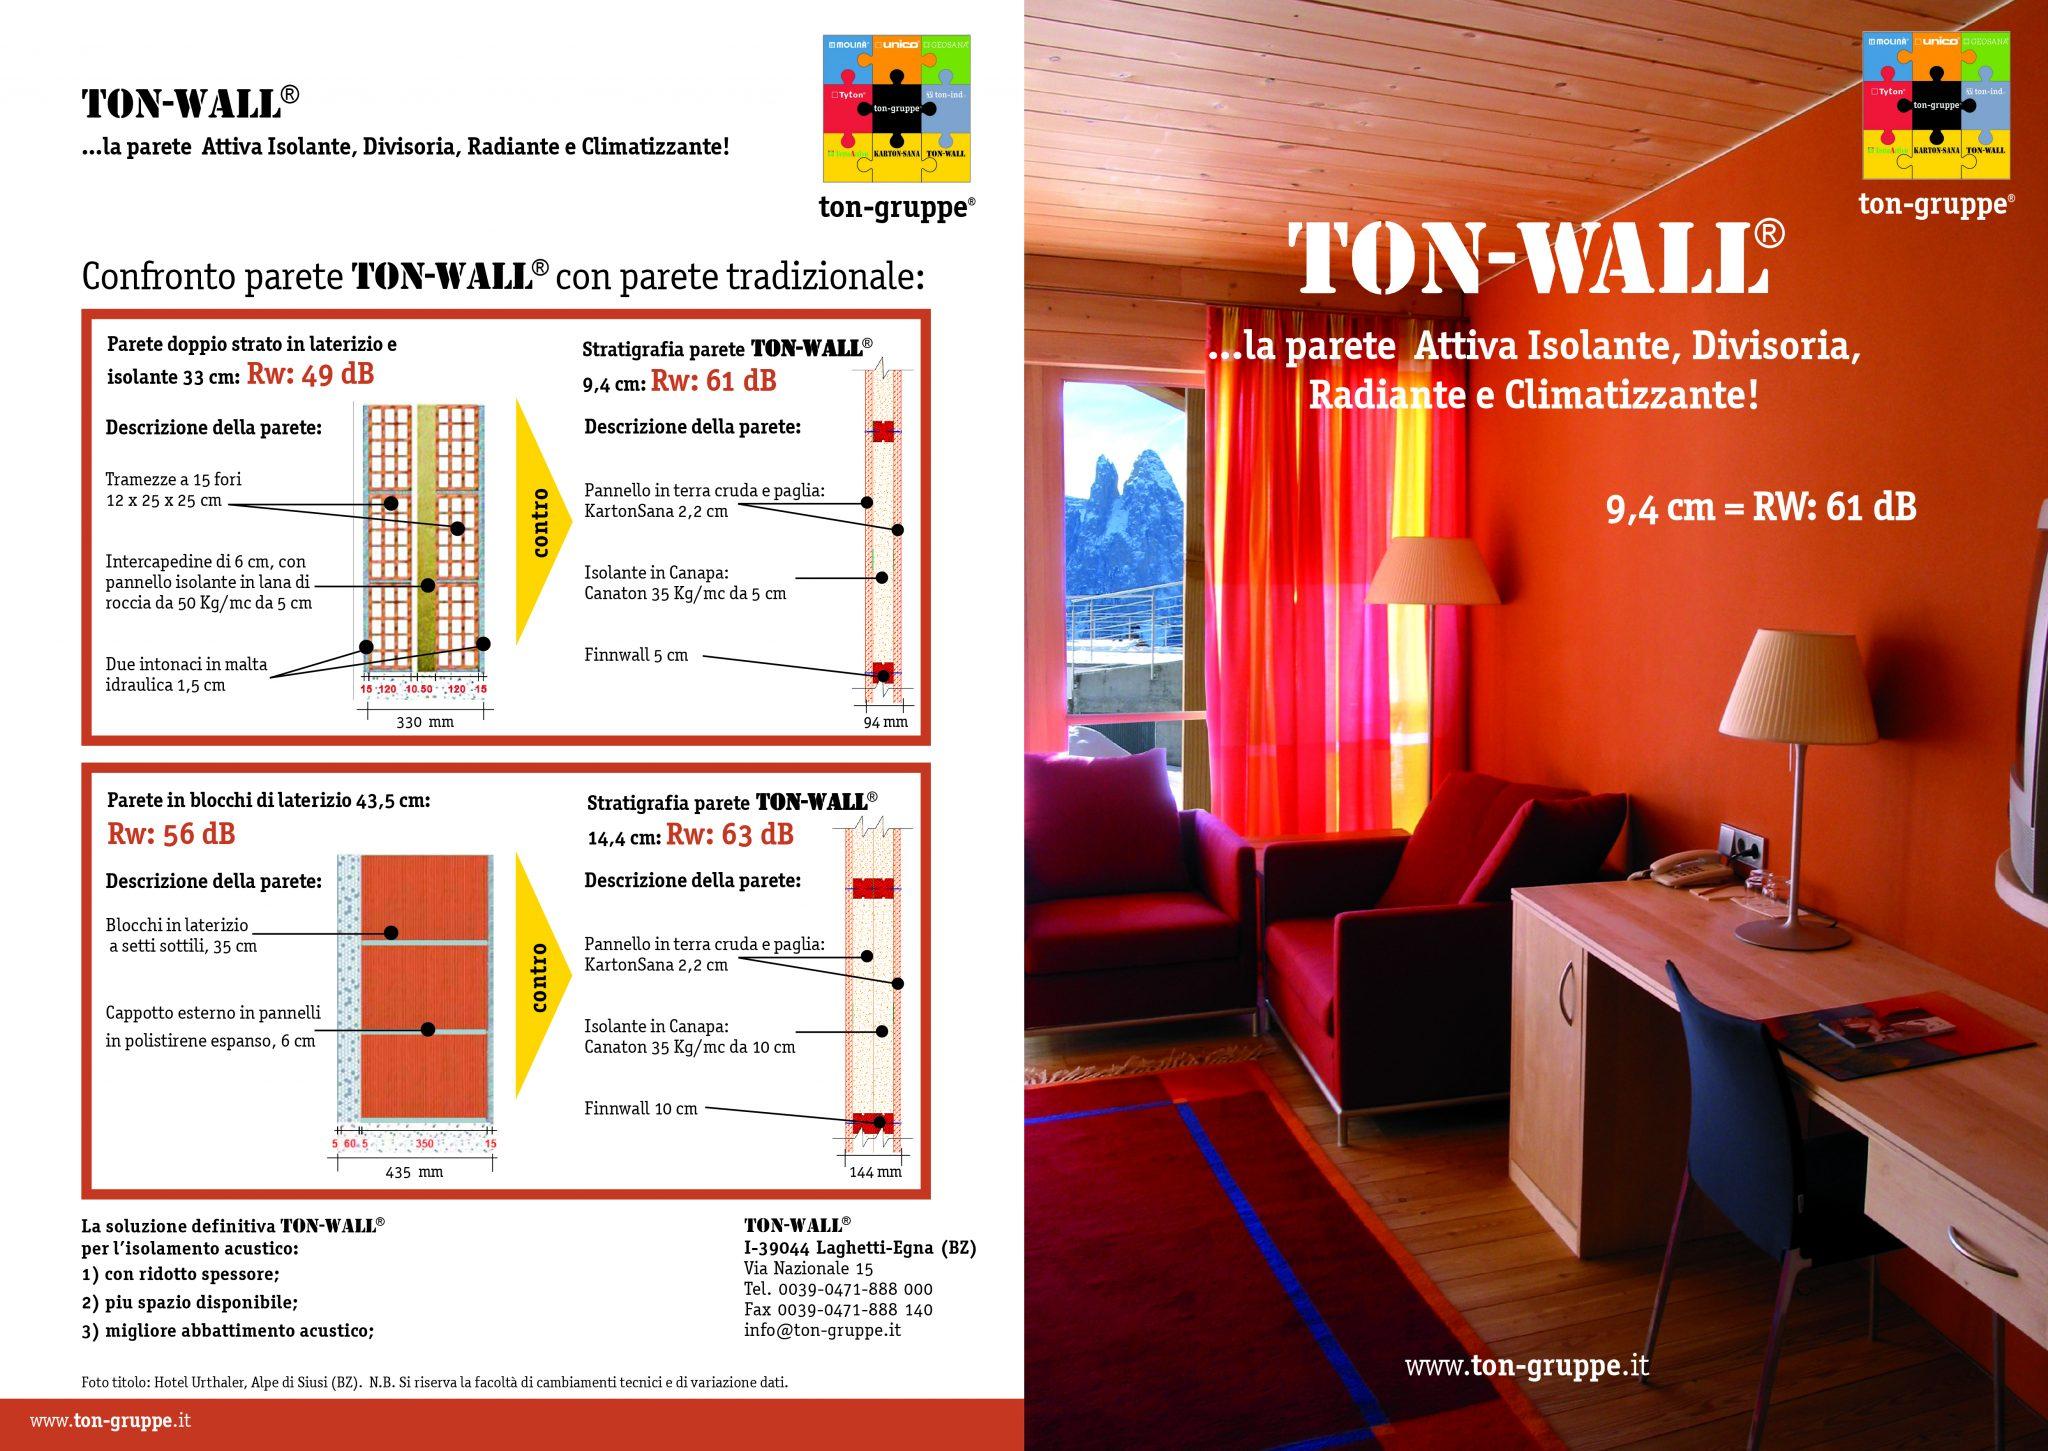 TonWallDep2011_IT.pmd